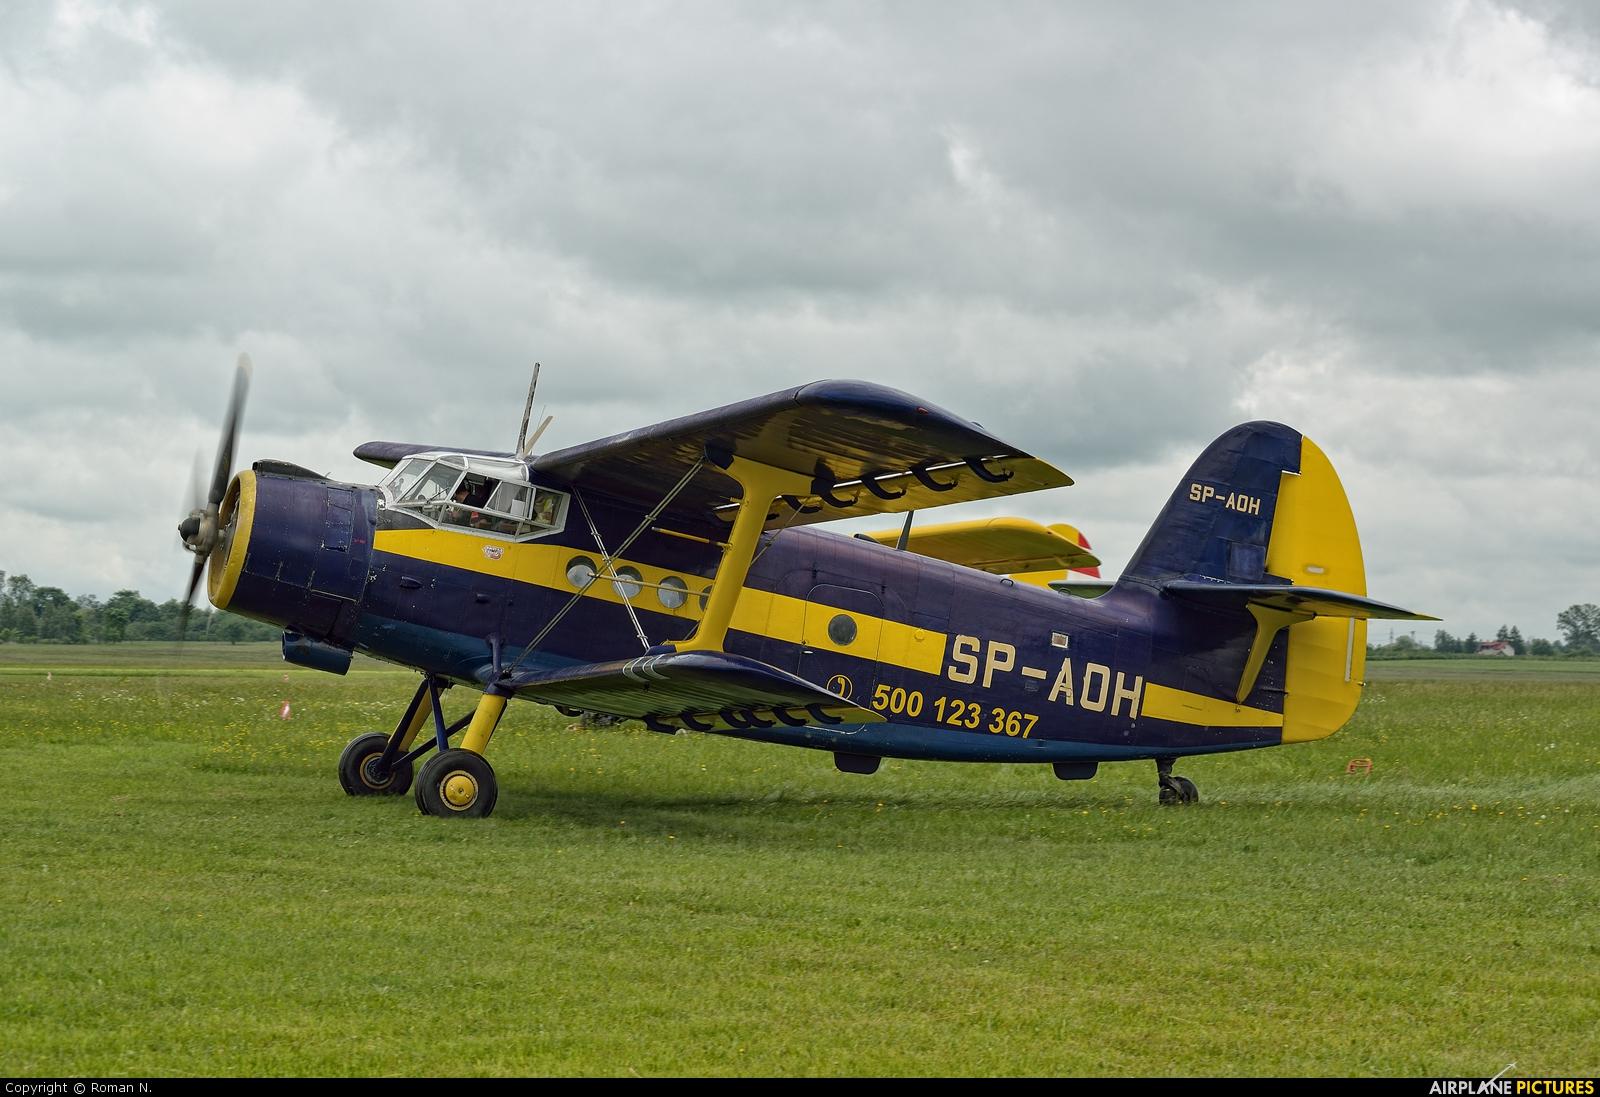 Aeroklub Ziemi Lubuskiej SP-AOH aircraft at Płock